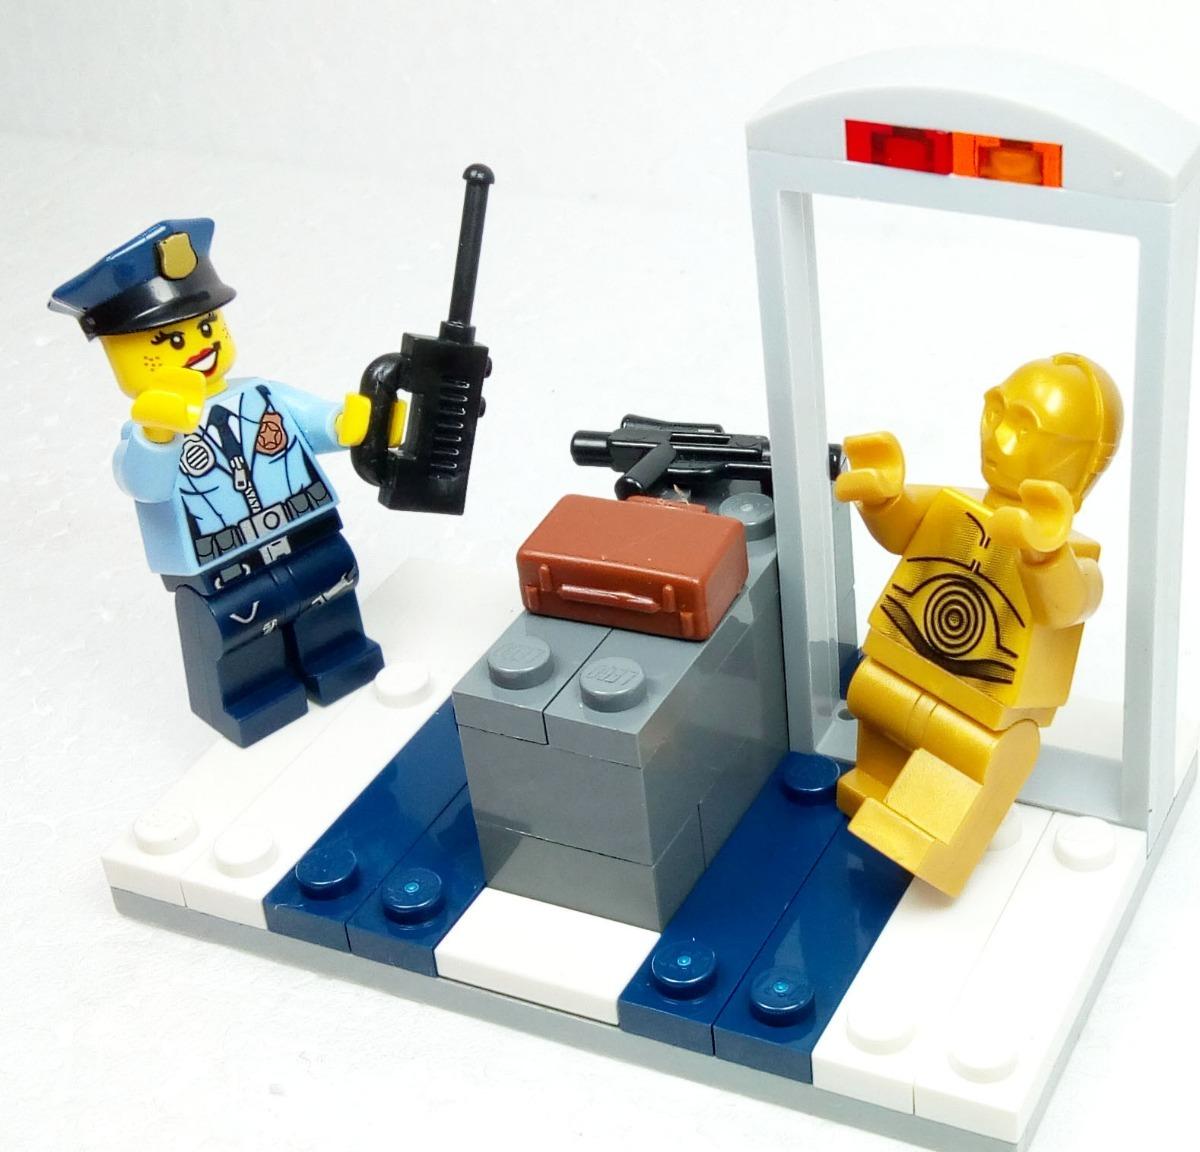 Aeroporto Lego : Lego original c po no aeroporto engraçado star wars r em